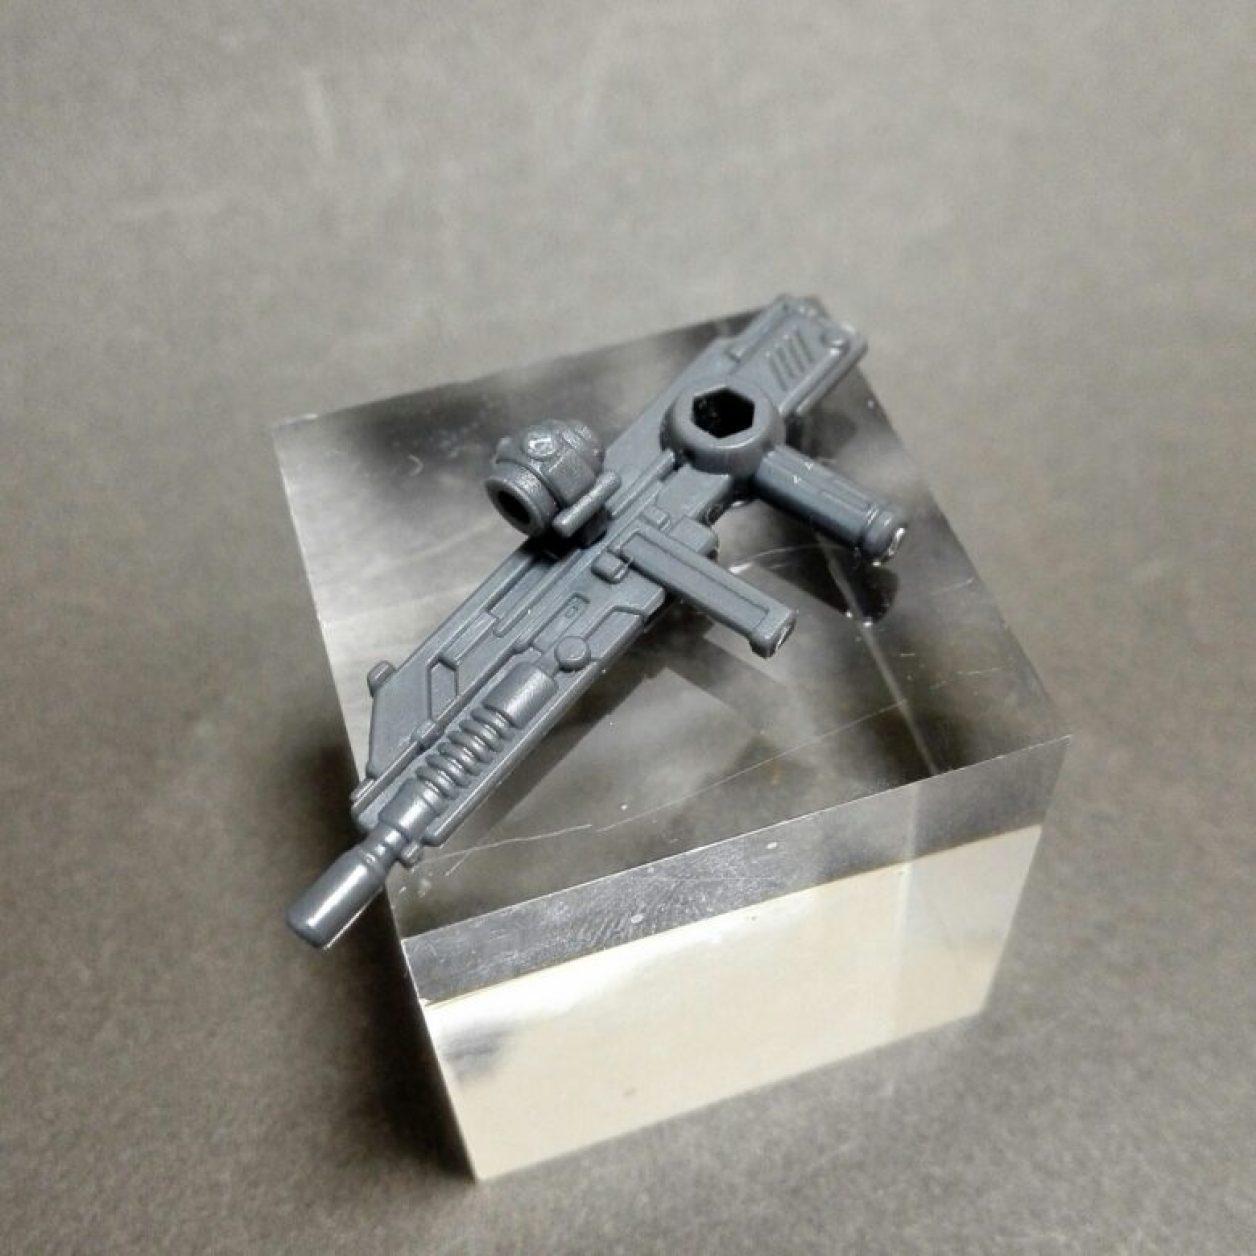 MOBILE SUIT ENSEMBLE 12弾のMS武器セットのfaガンダム用ビーム・ライフルの画像